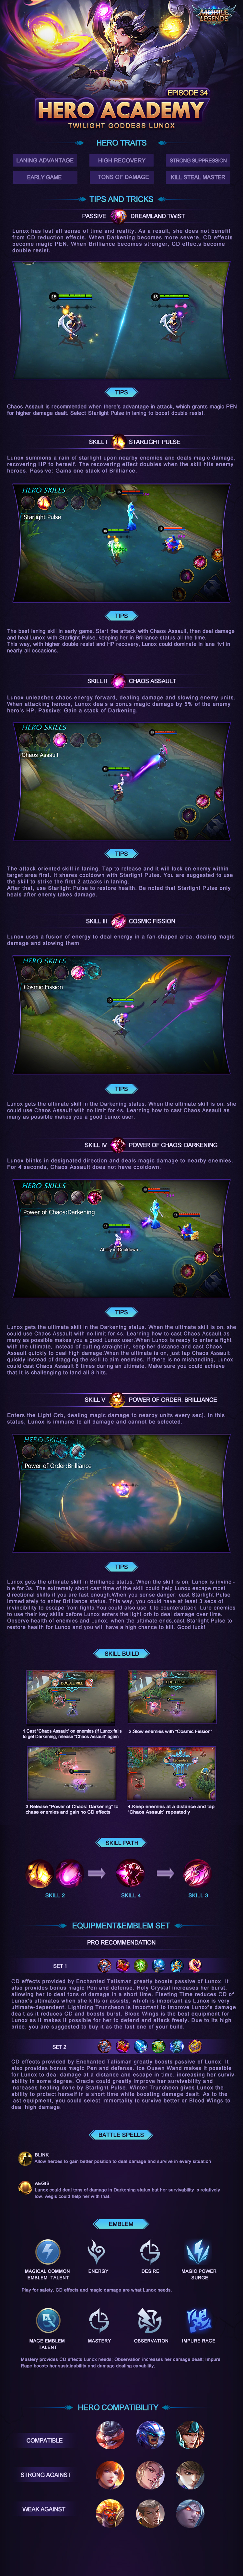 Hero Academy - Lunox 丨Episode #34 - Mobile Legends - Mid Or